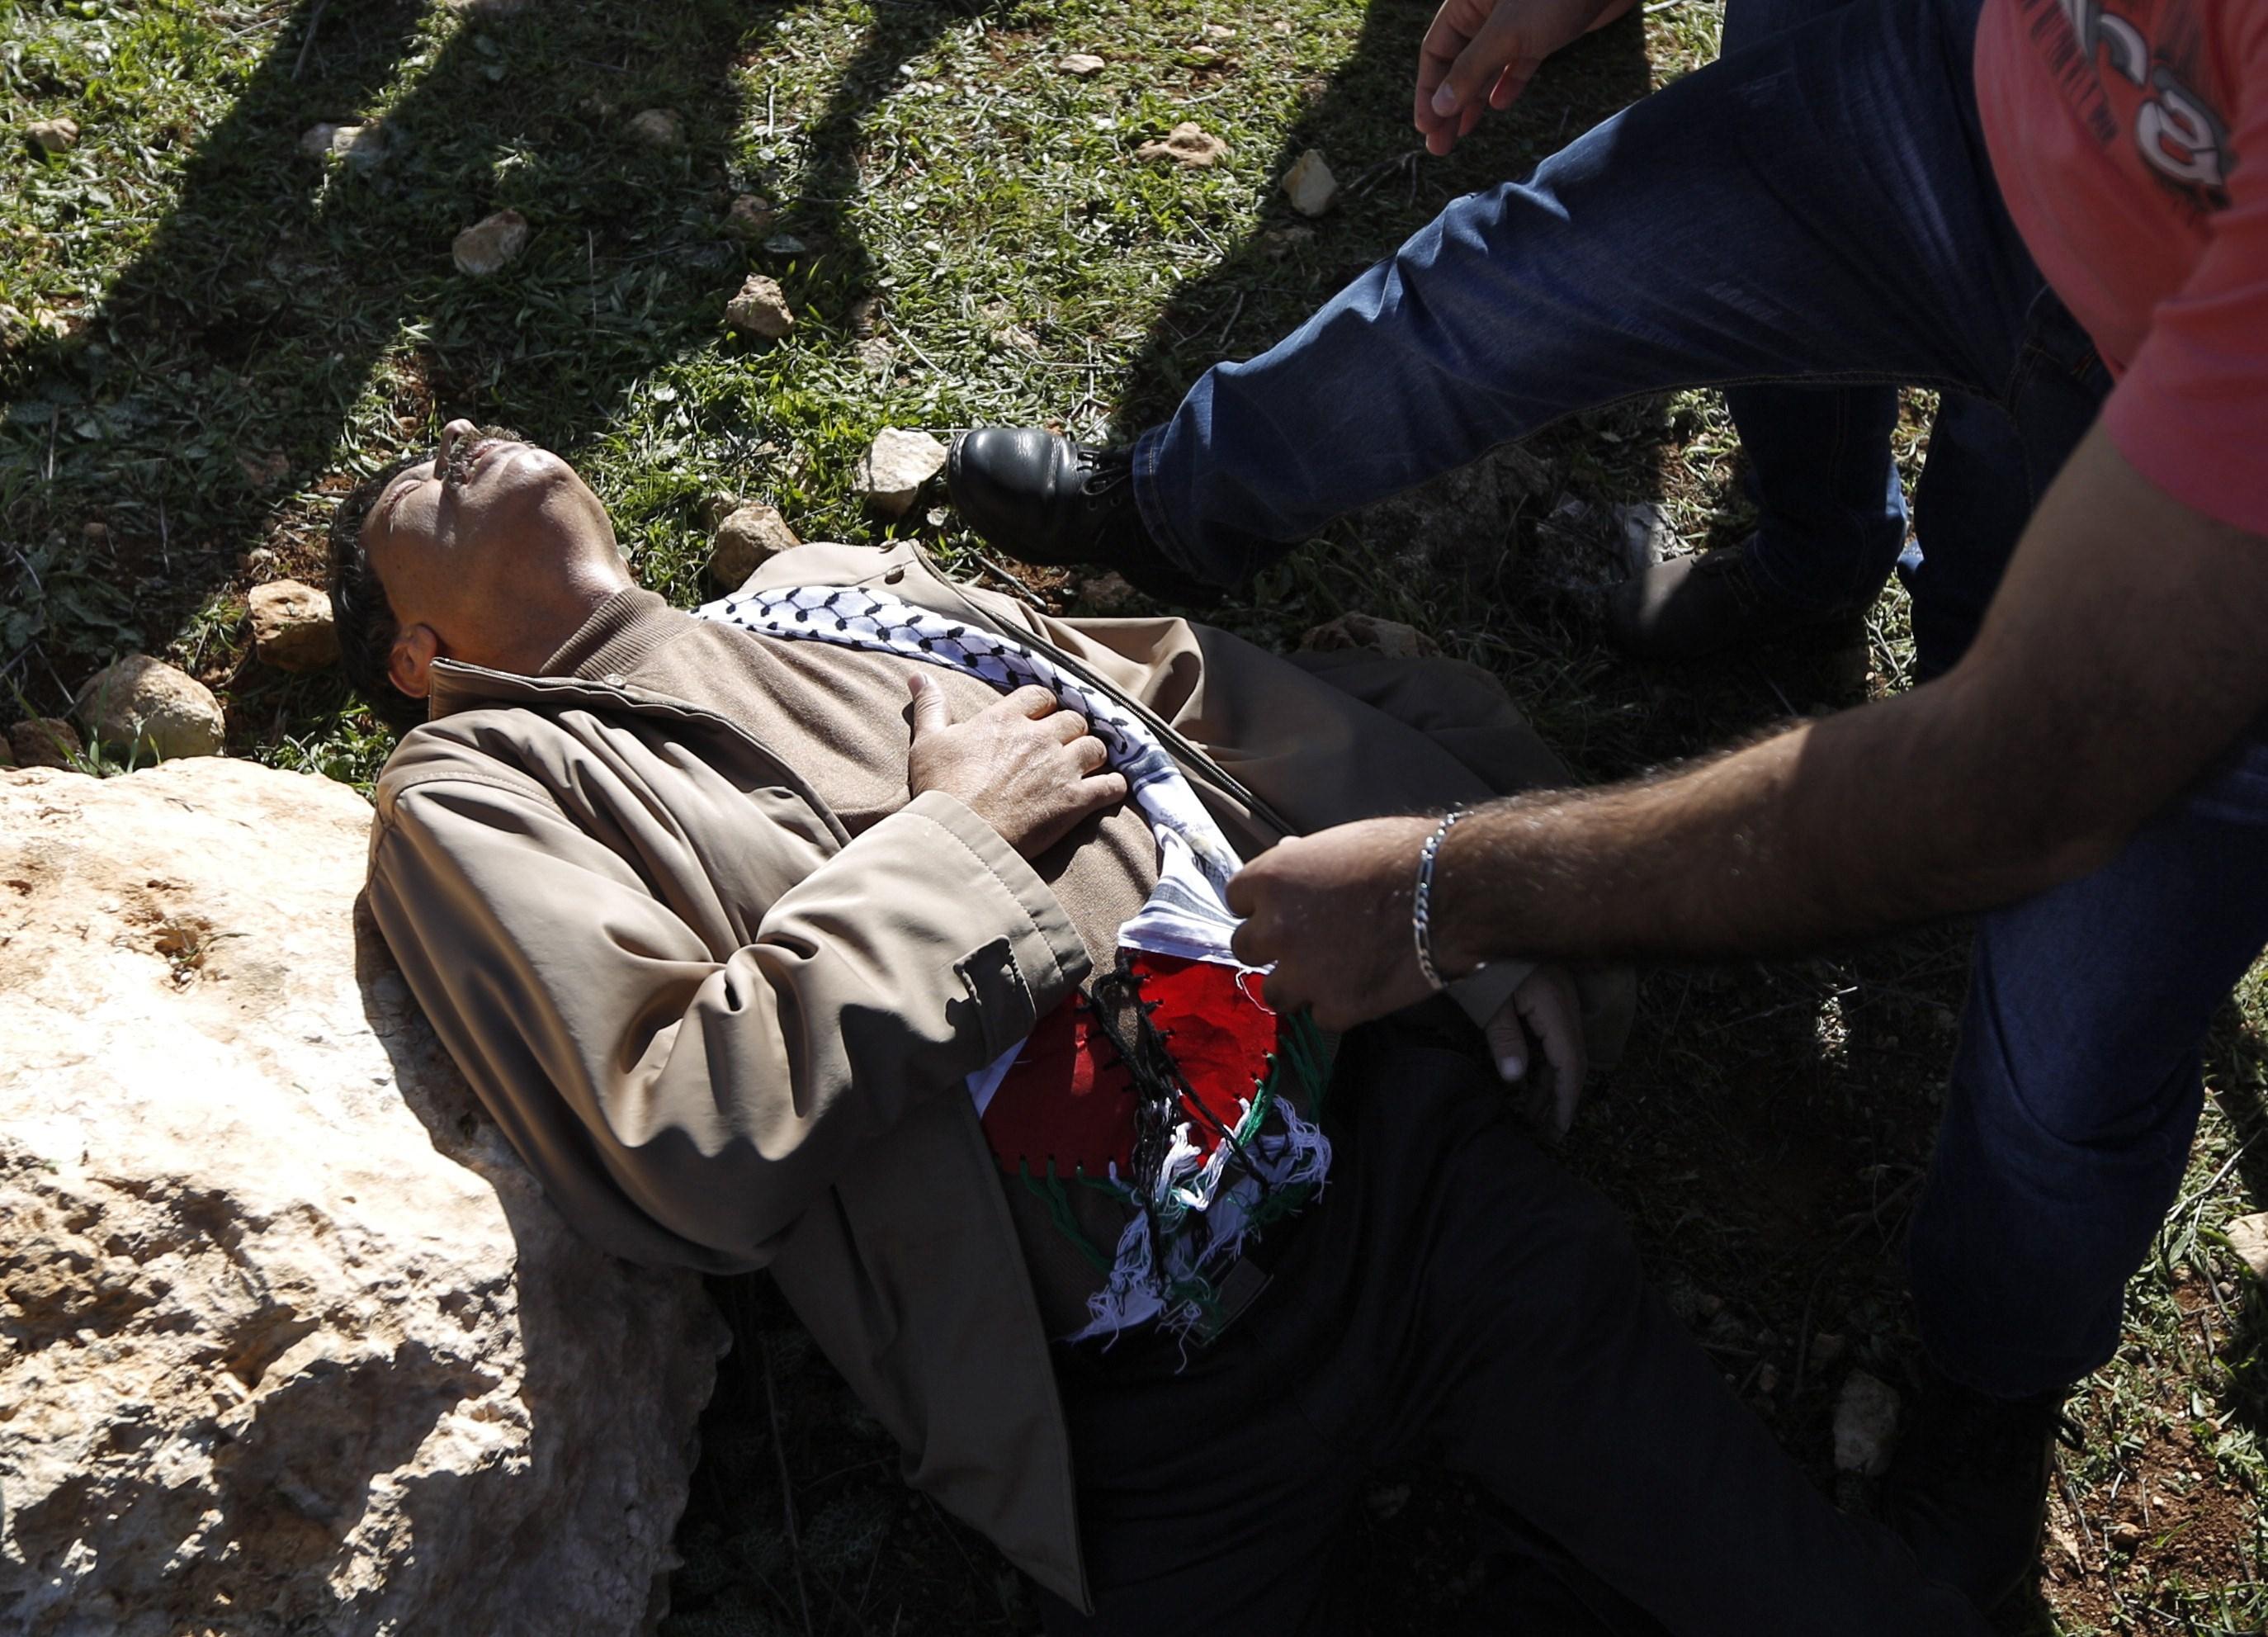 Nou butoi cu pulbere. UE si ONU cer anchete dupa ce un ministru palestinian a fost ucis de armata israeliana in Cisiordania